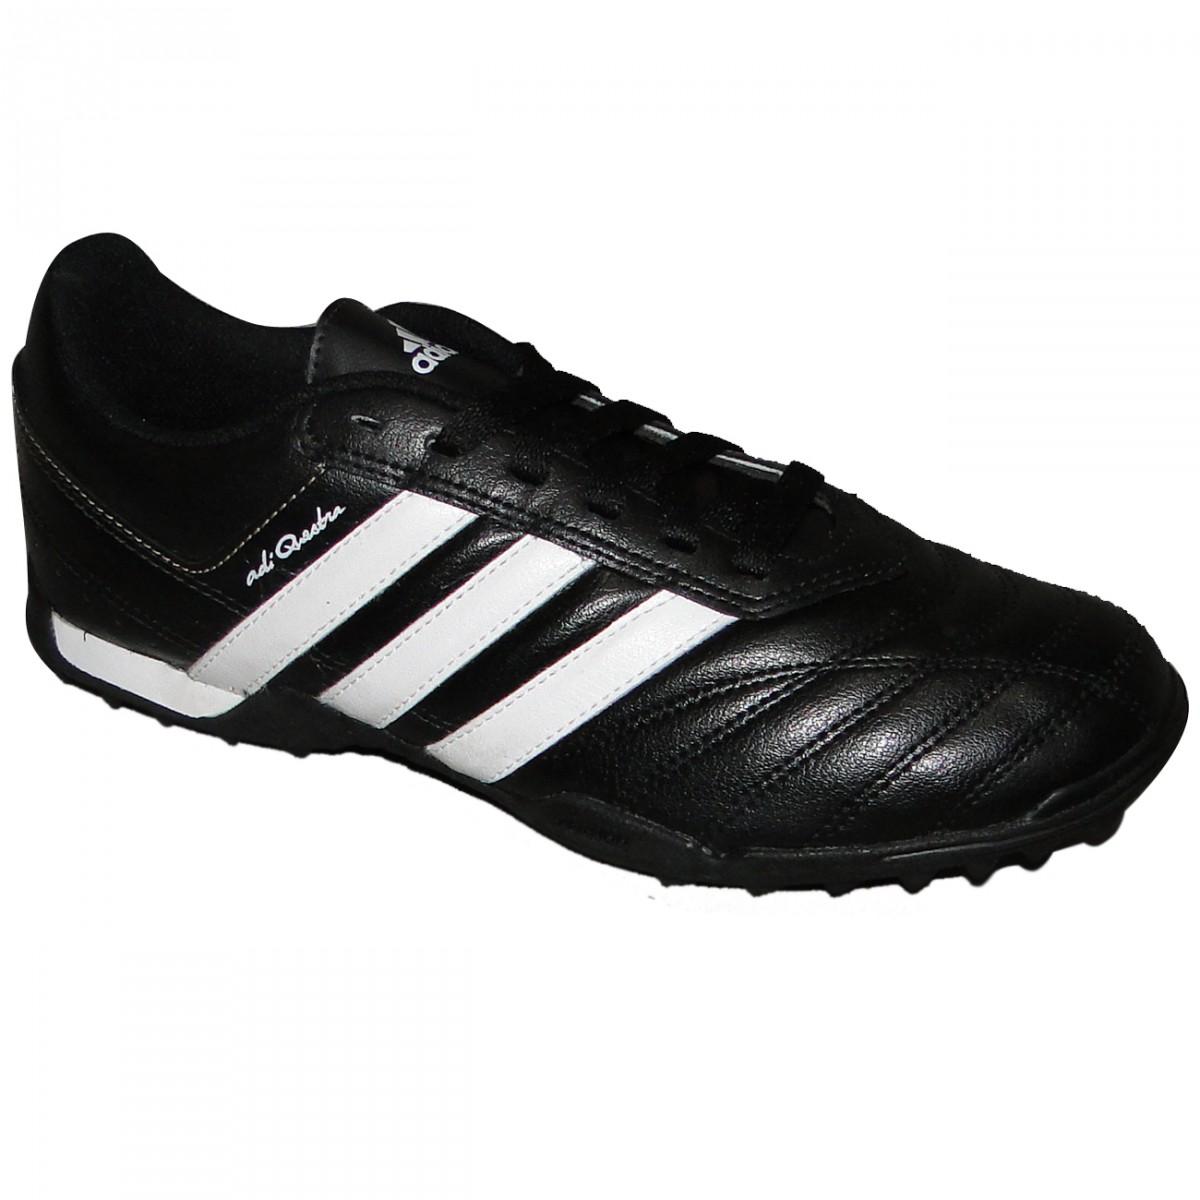 200682c776 Chuteira Society Adidas Adiquestra 1963 - PRETO BRANCO - Chuteira Nike